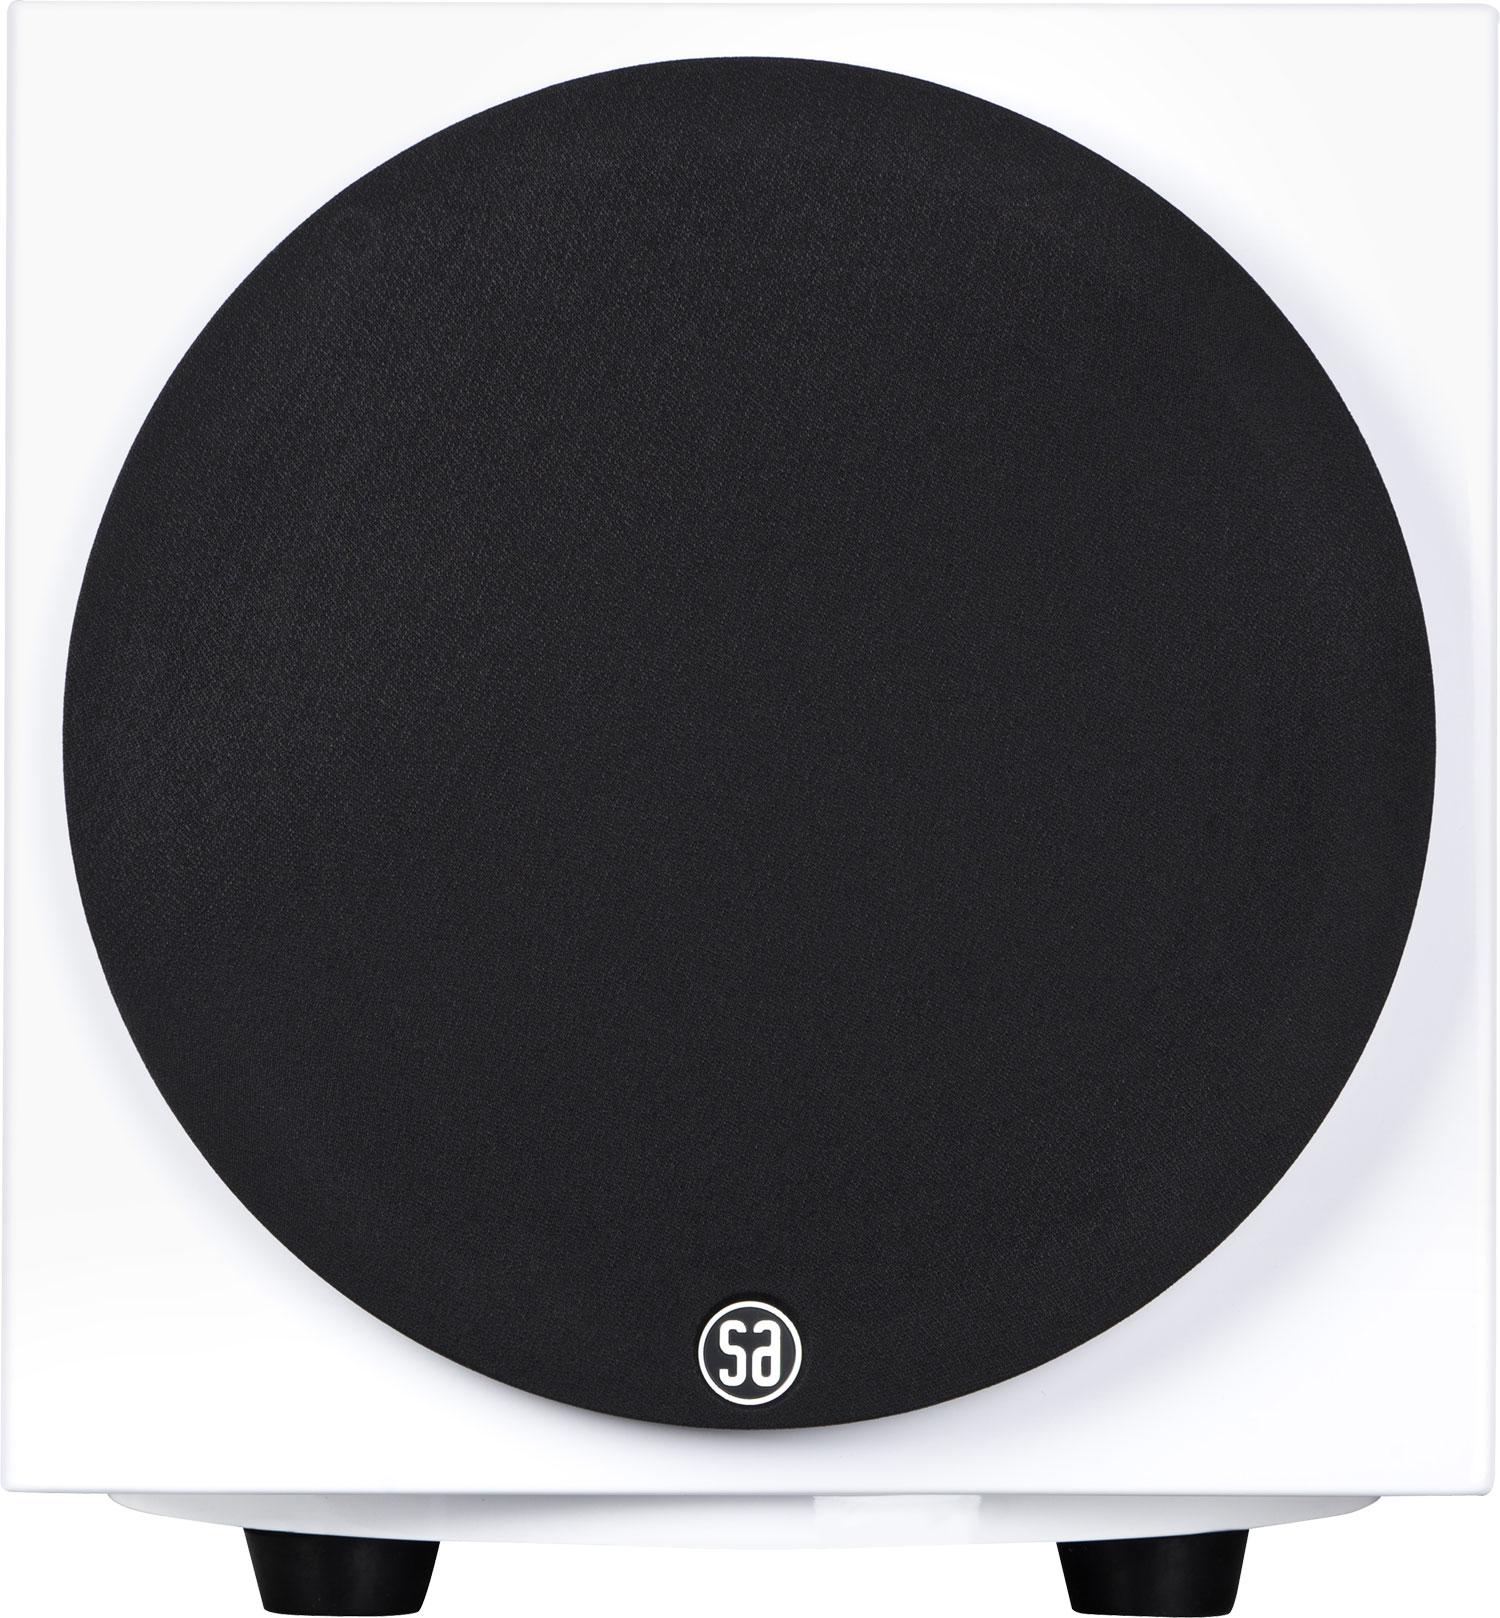 System Audio Saxo Sub 10 subwoofer